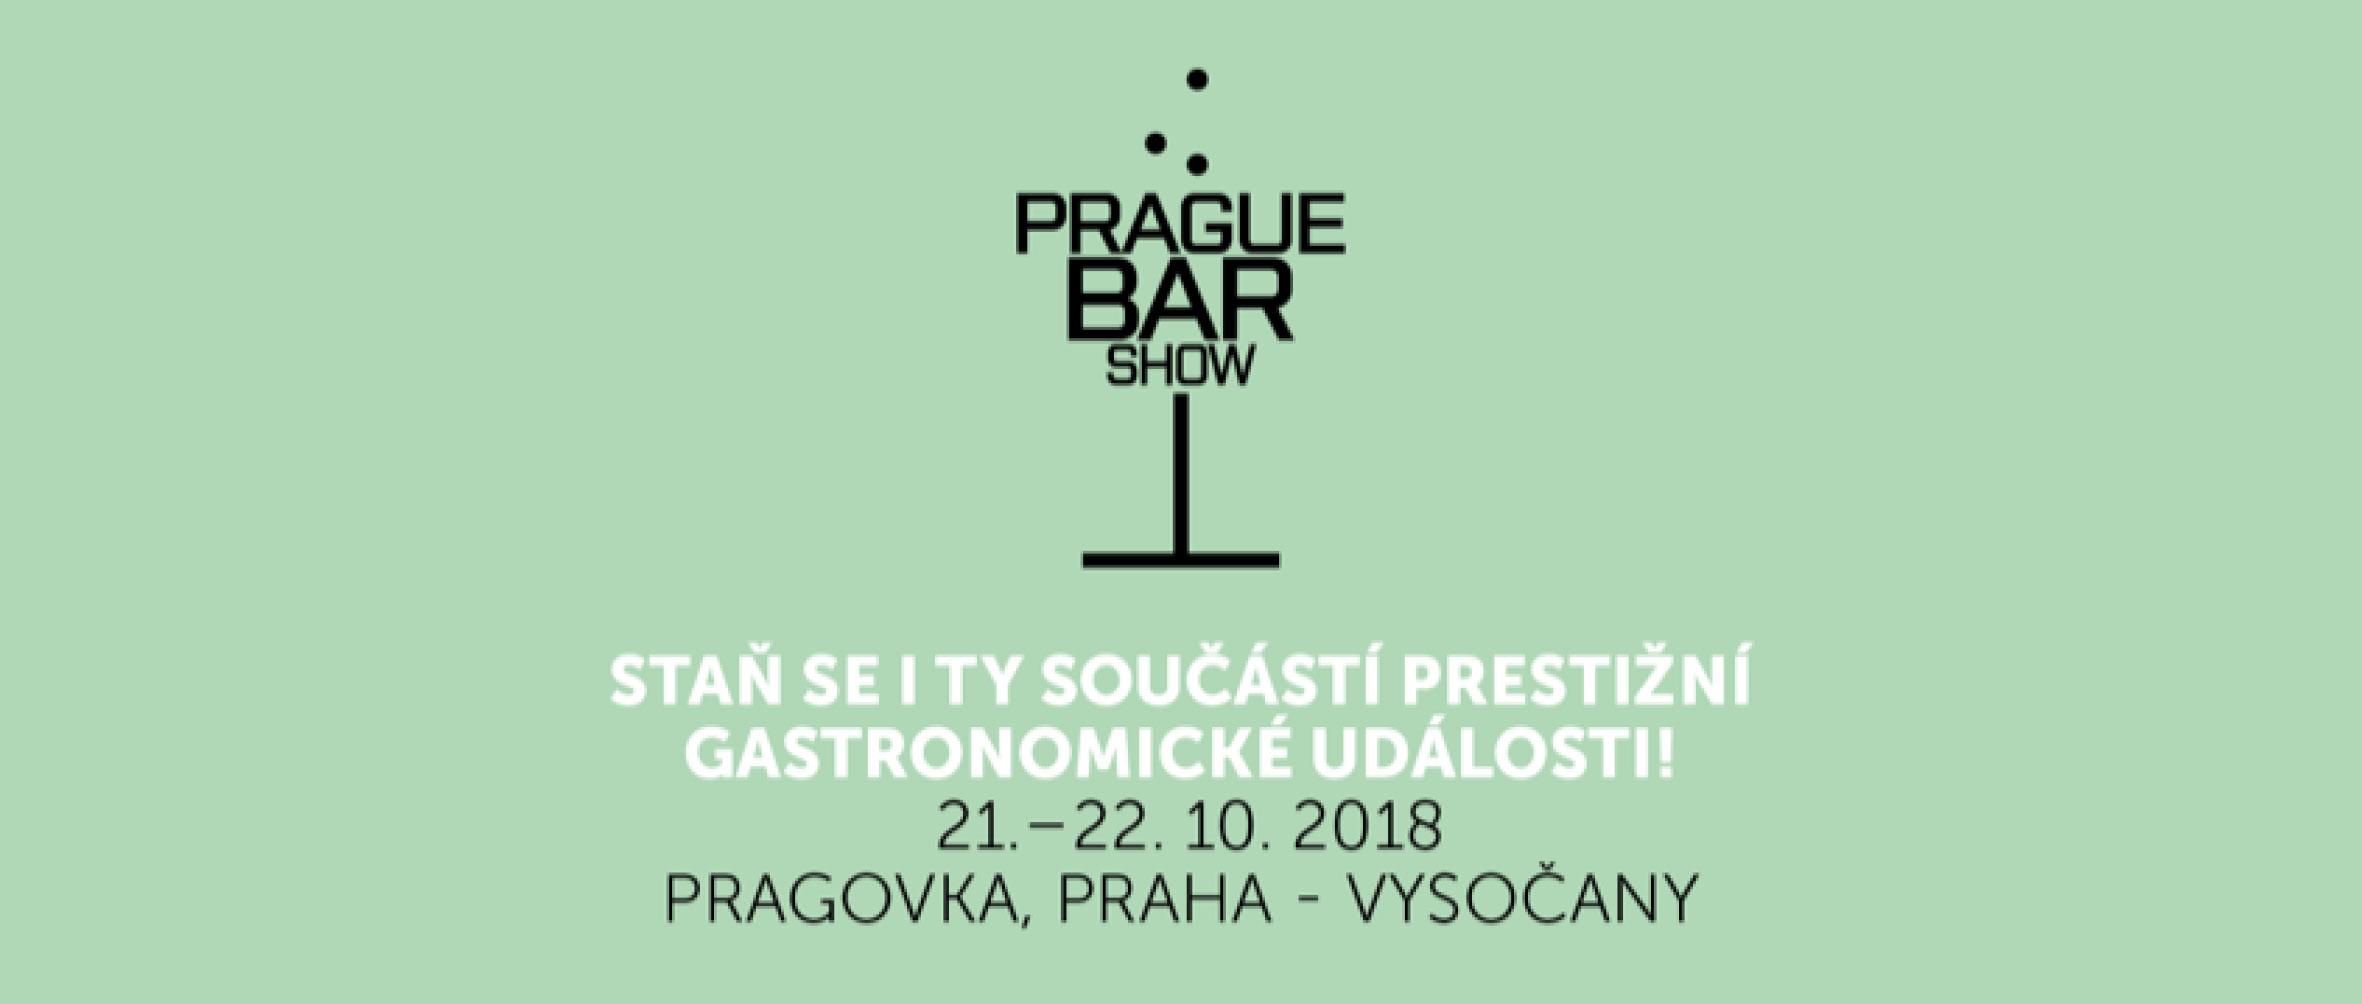 Prague bar show